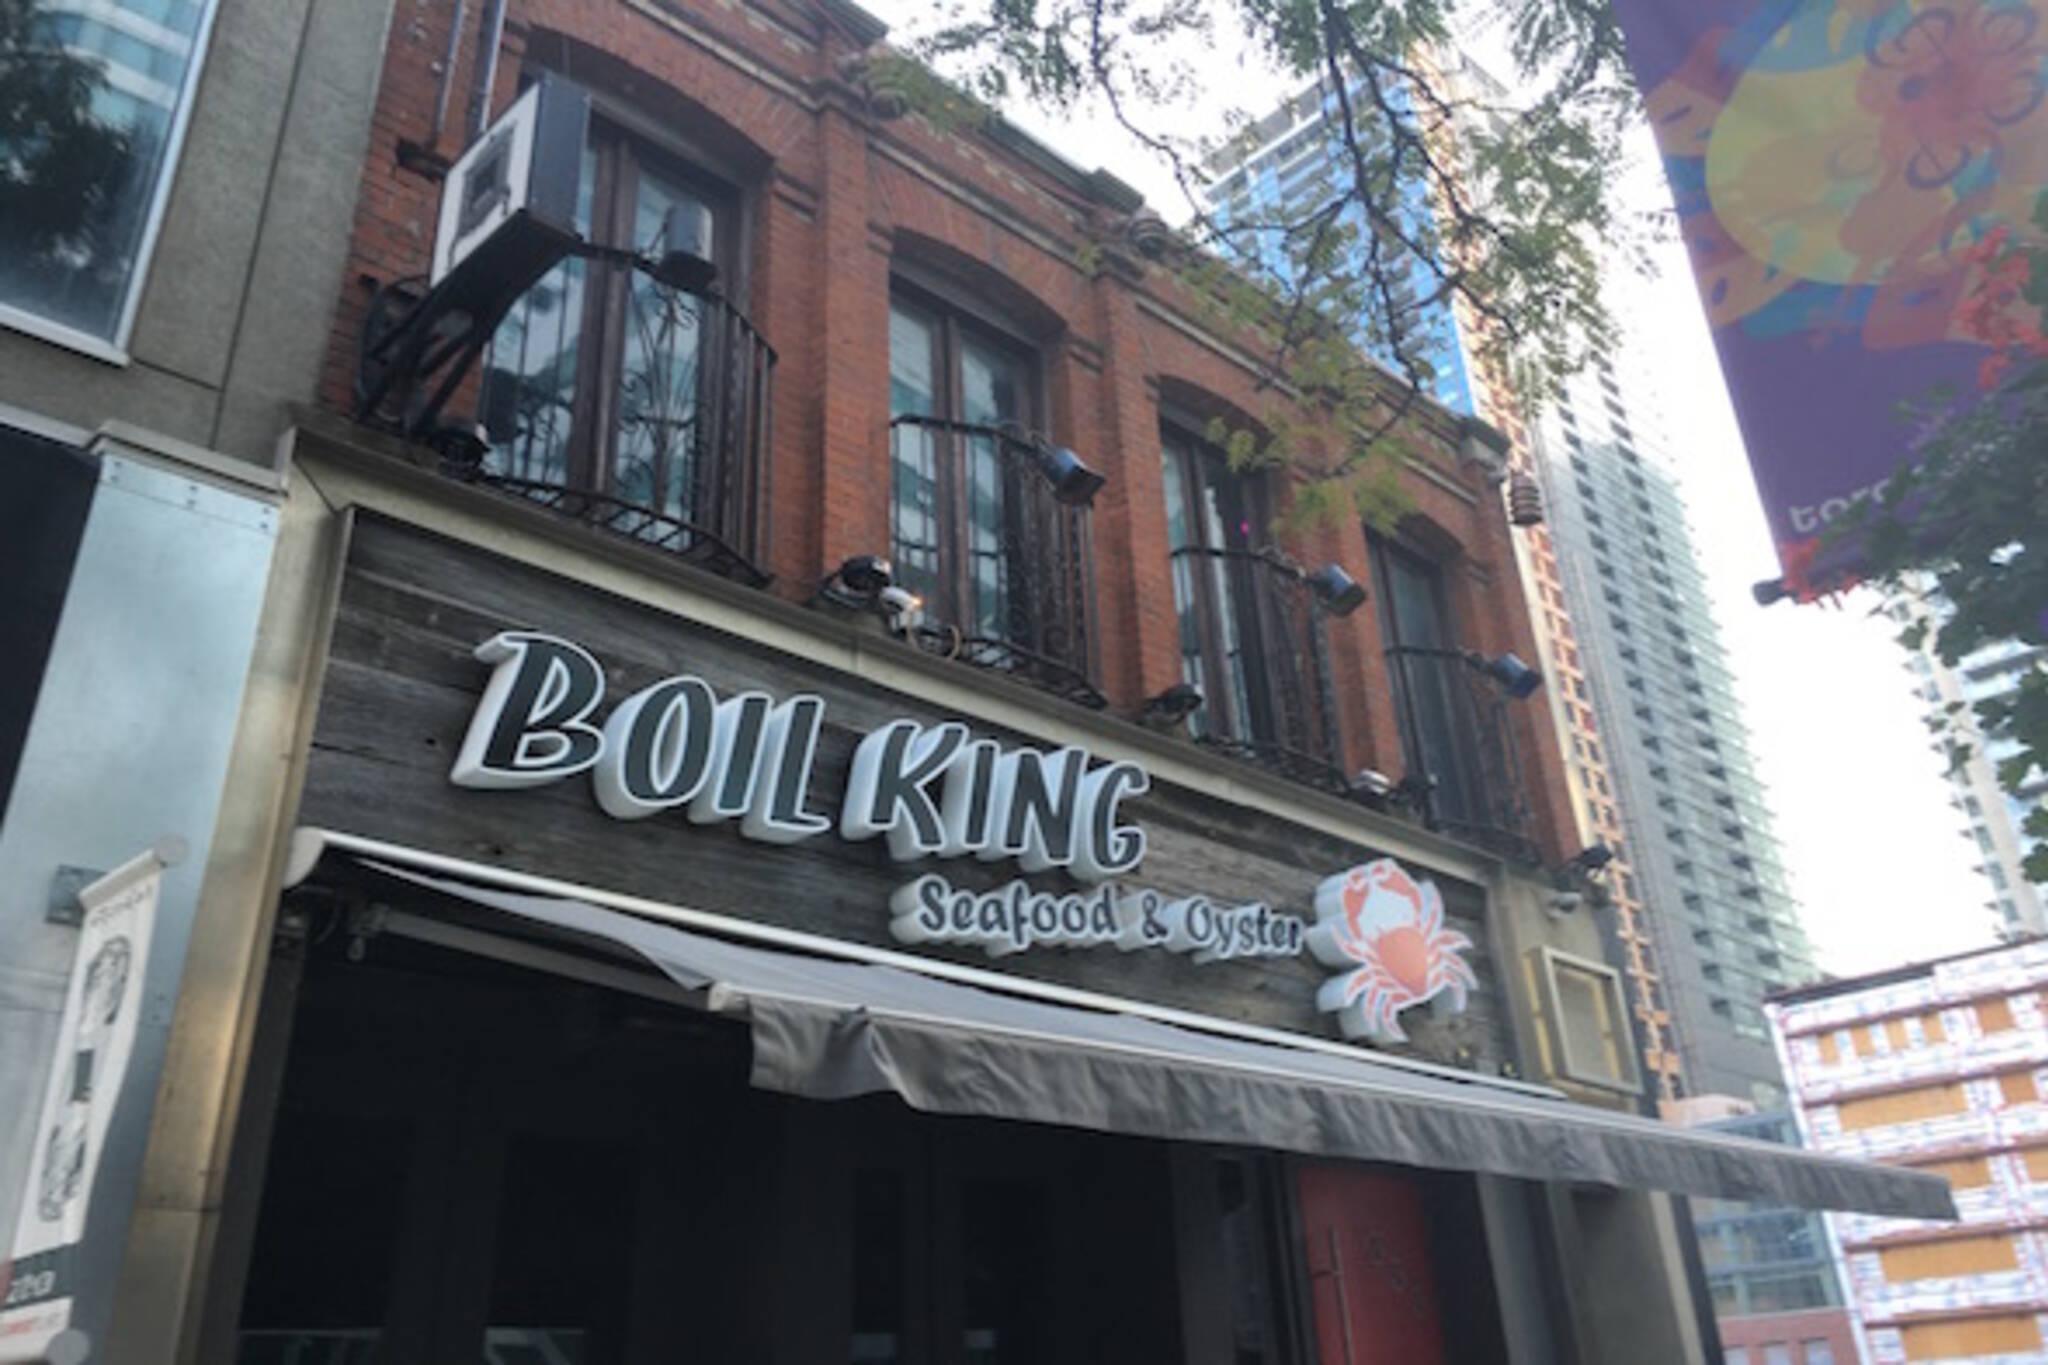 Boil King Toronto